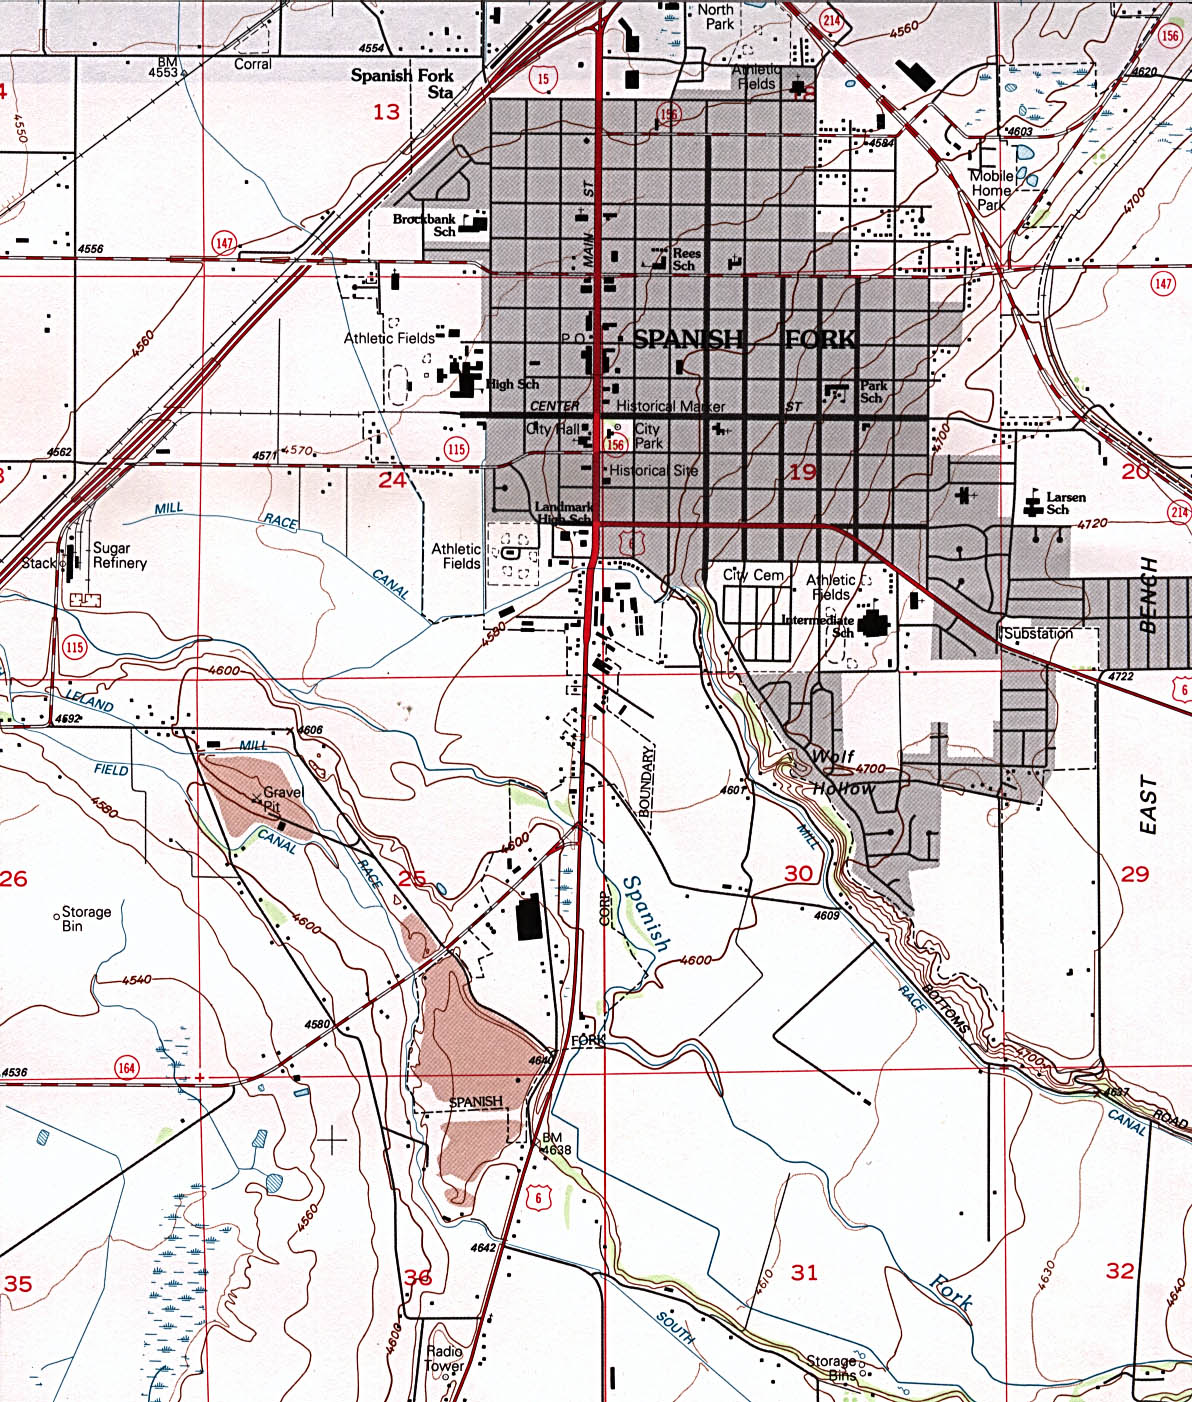 Spanish Fork Topographic City Map, Utah, United States